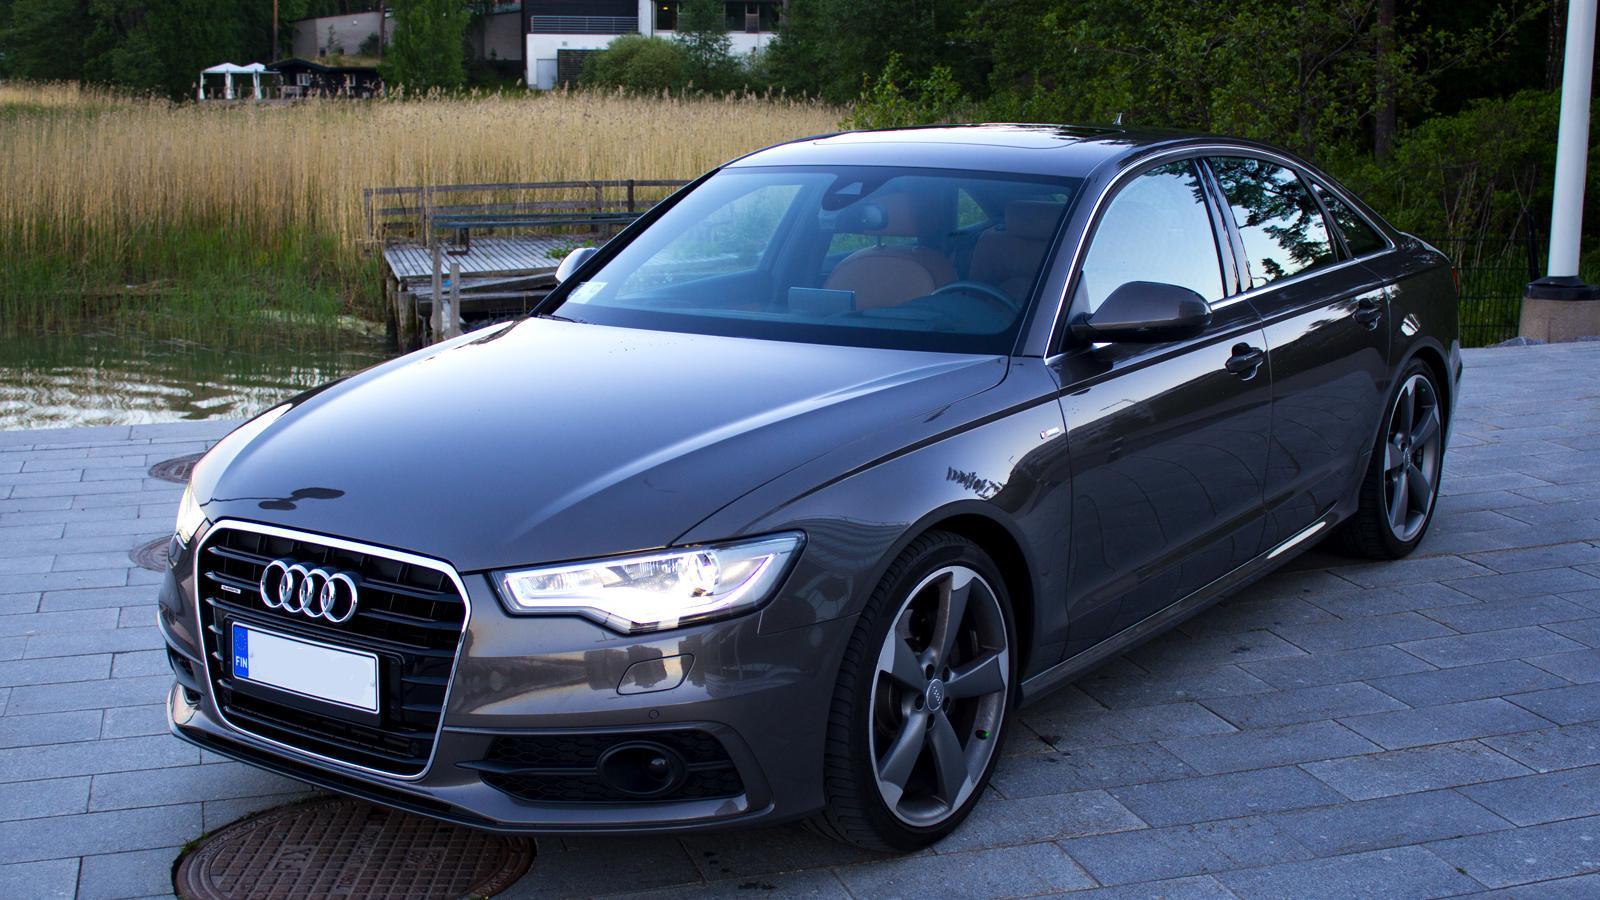 Audi-A6-C7-1